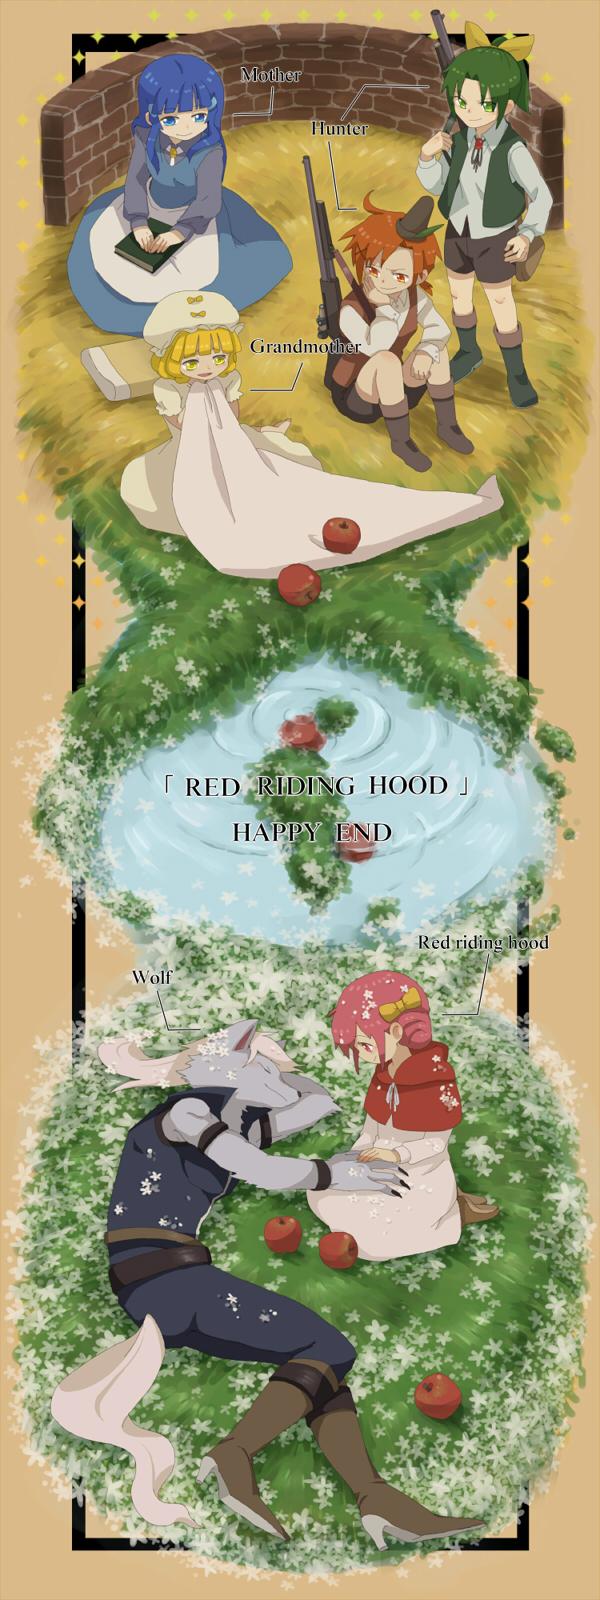 Tags: Anime, Smile Precure!, Red Riding Hood, Hoshizora Miyuki, Kise Yayoi, Aoki Reika, Midorikawa Nao, Hino Akane, Wolfrun, Red Riding Hood (Cosplay), Hunter, Red Riding Hood (Parody), Grandmother